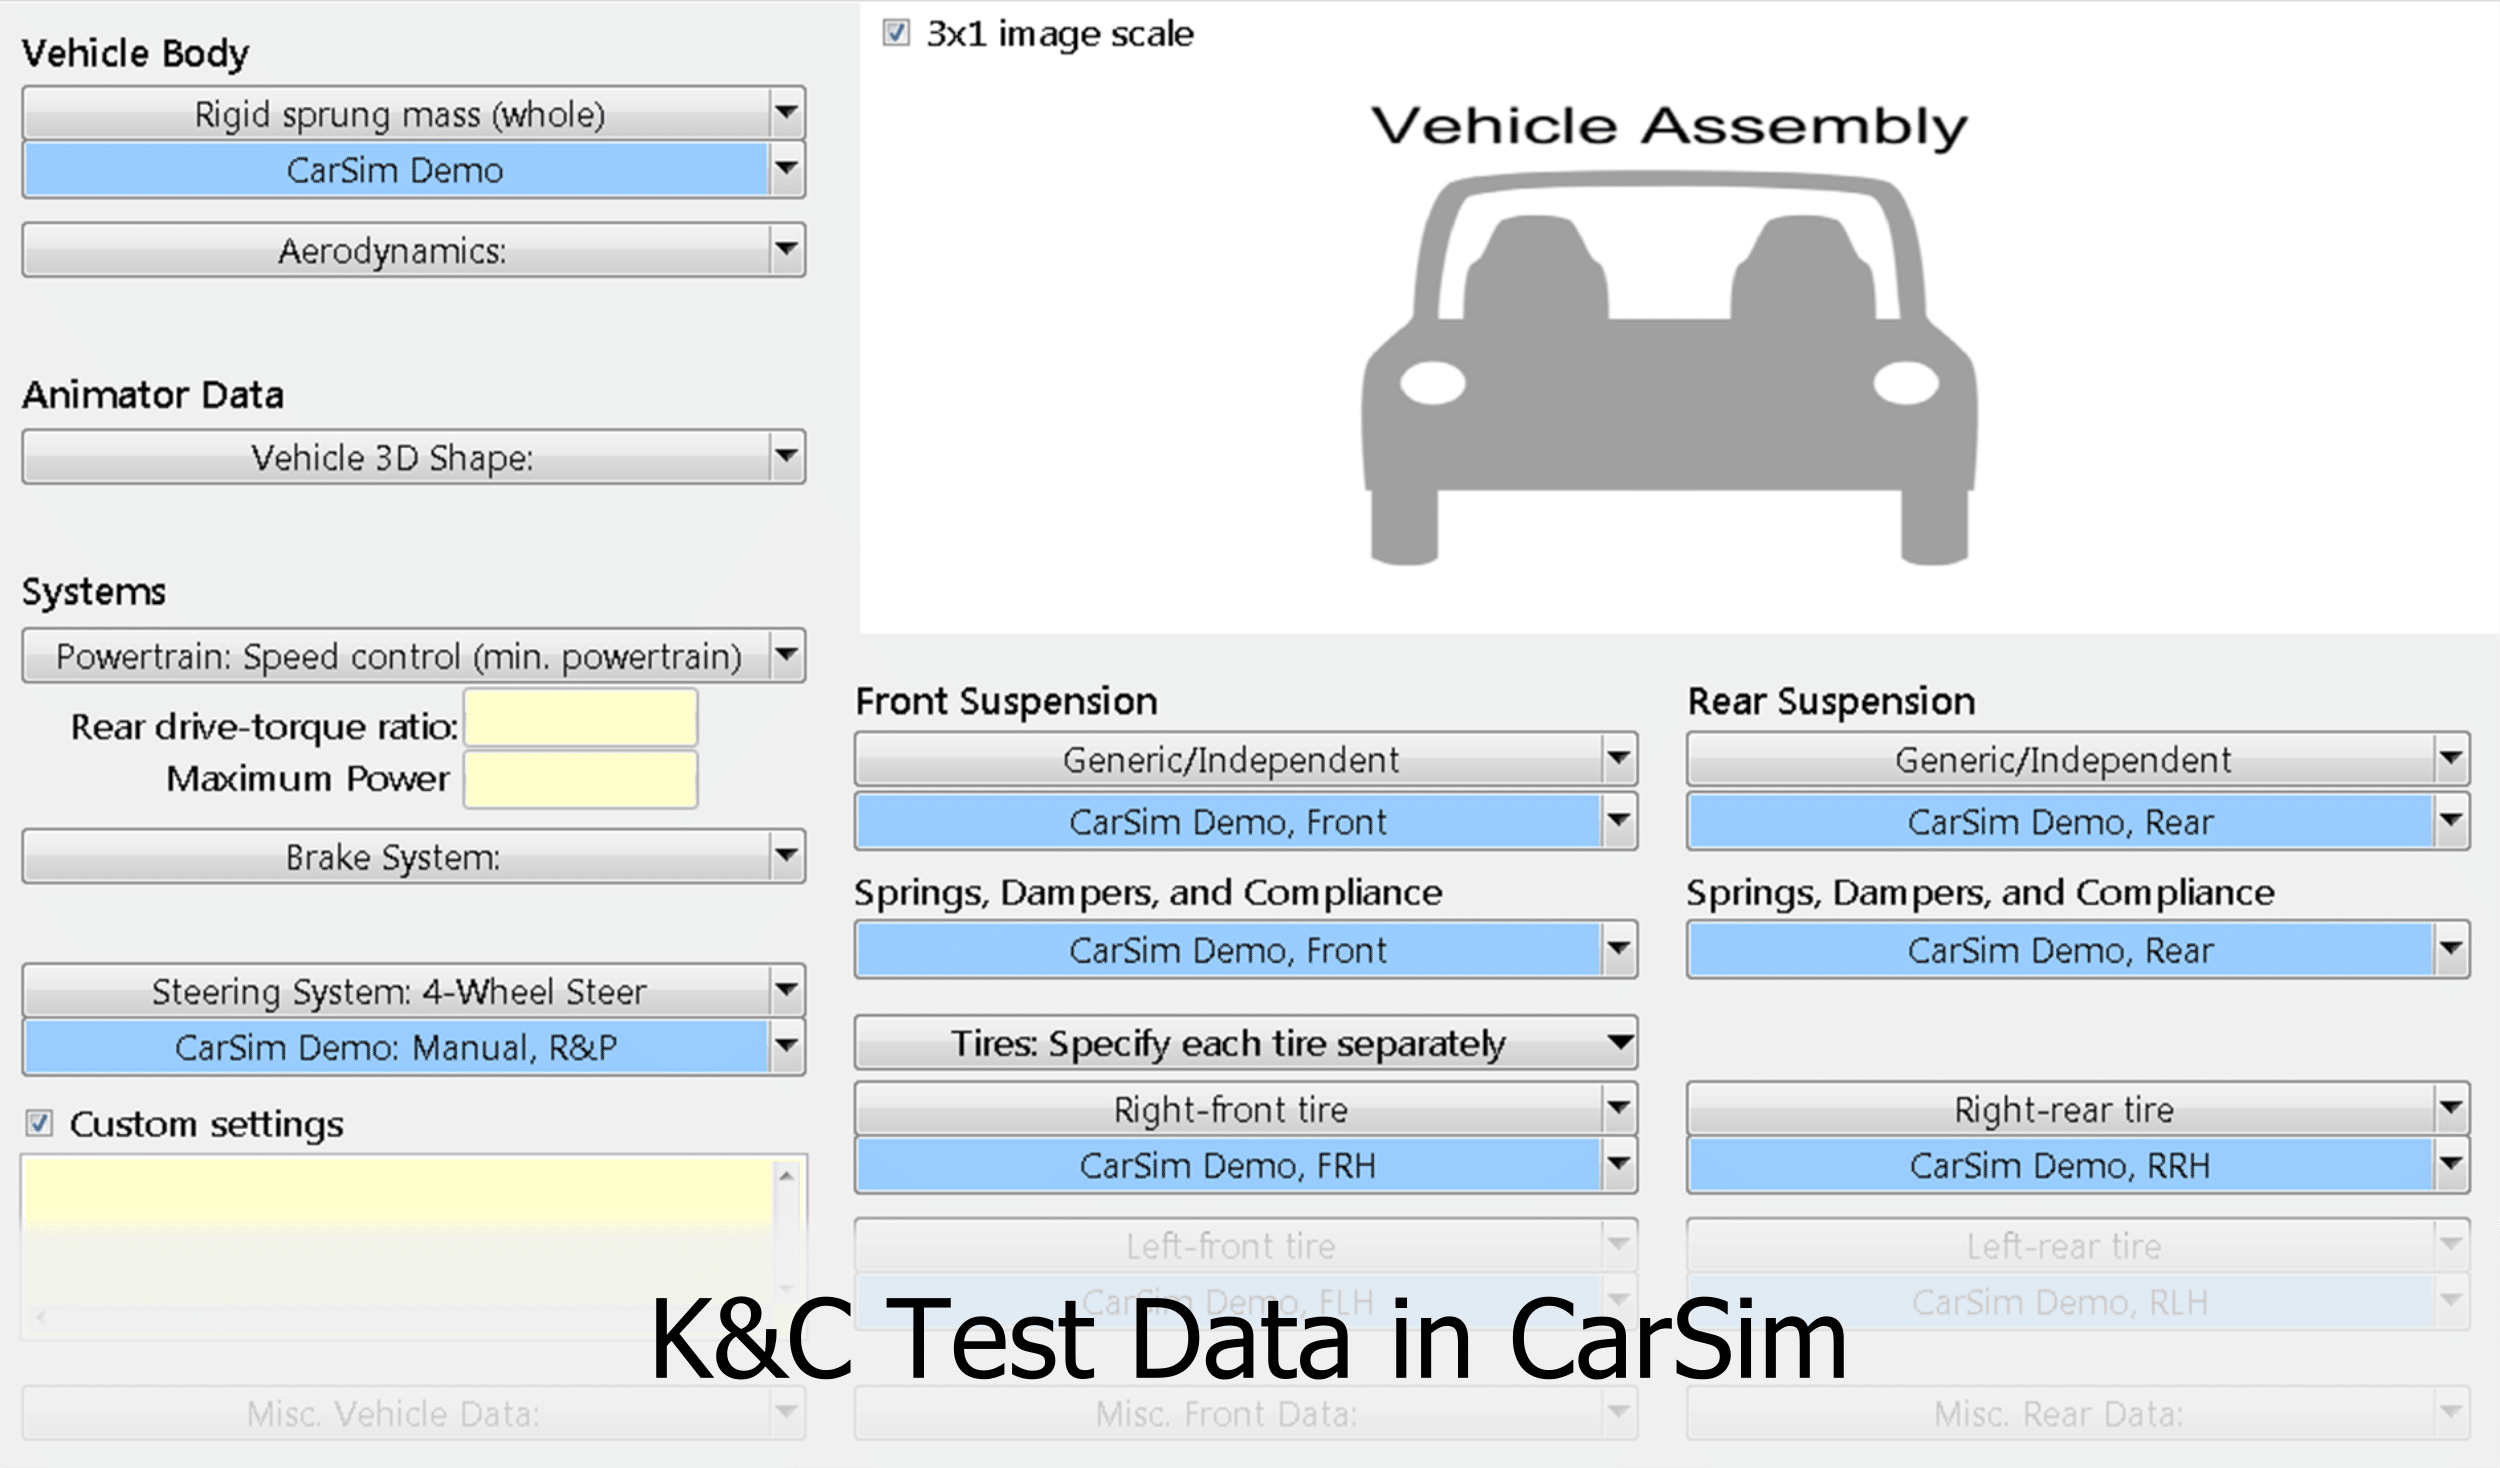 K&C data in CarSim through Parsfile